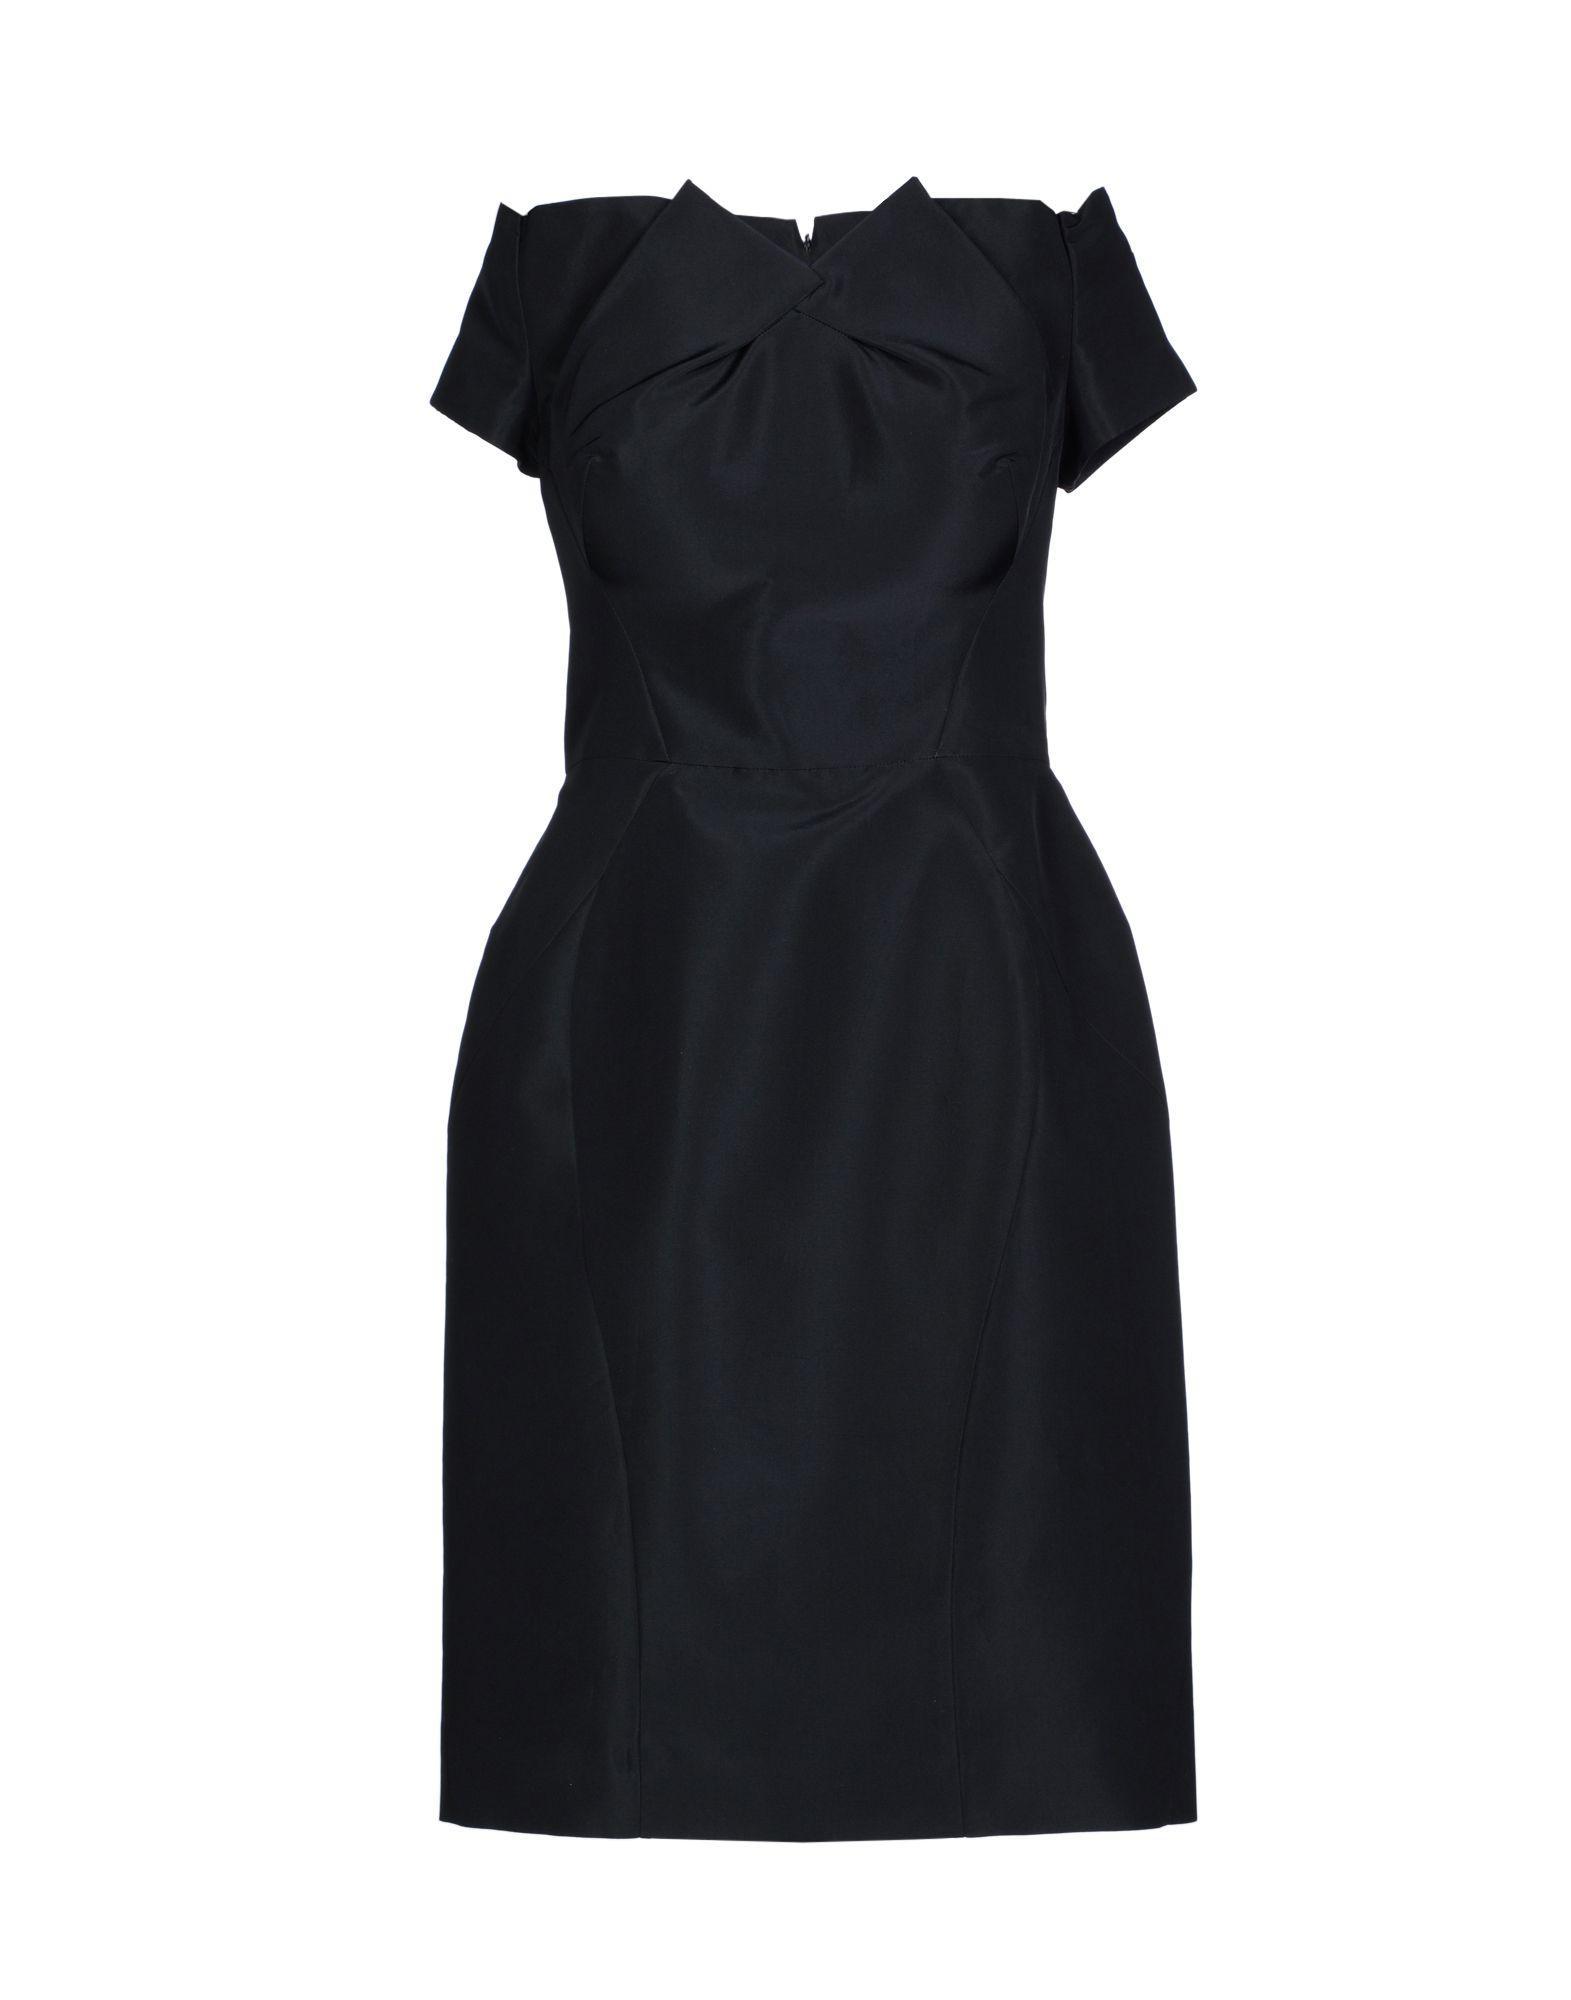 Zac Posen Knee-length Dress In Dark Blue